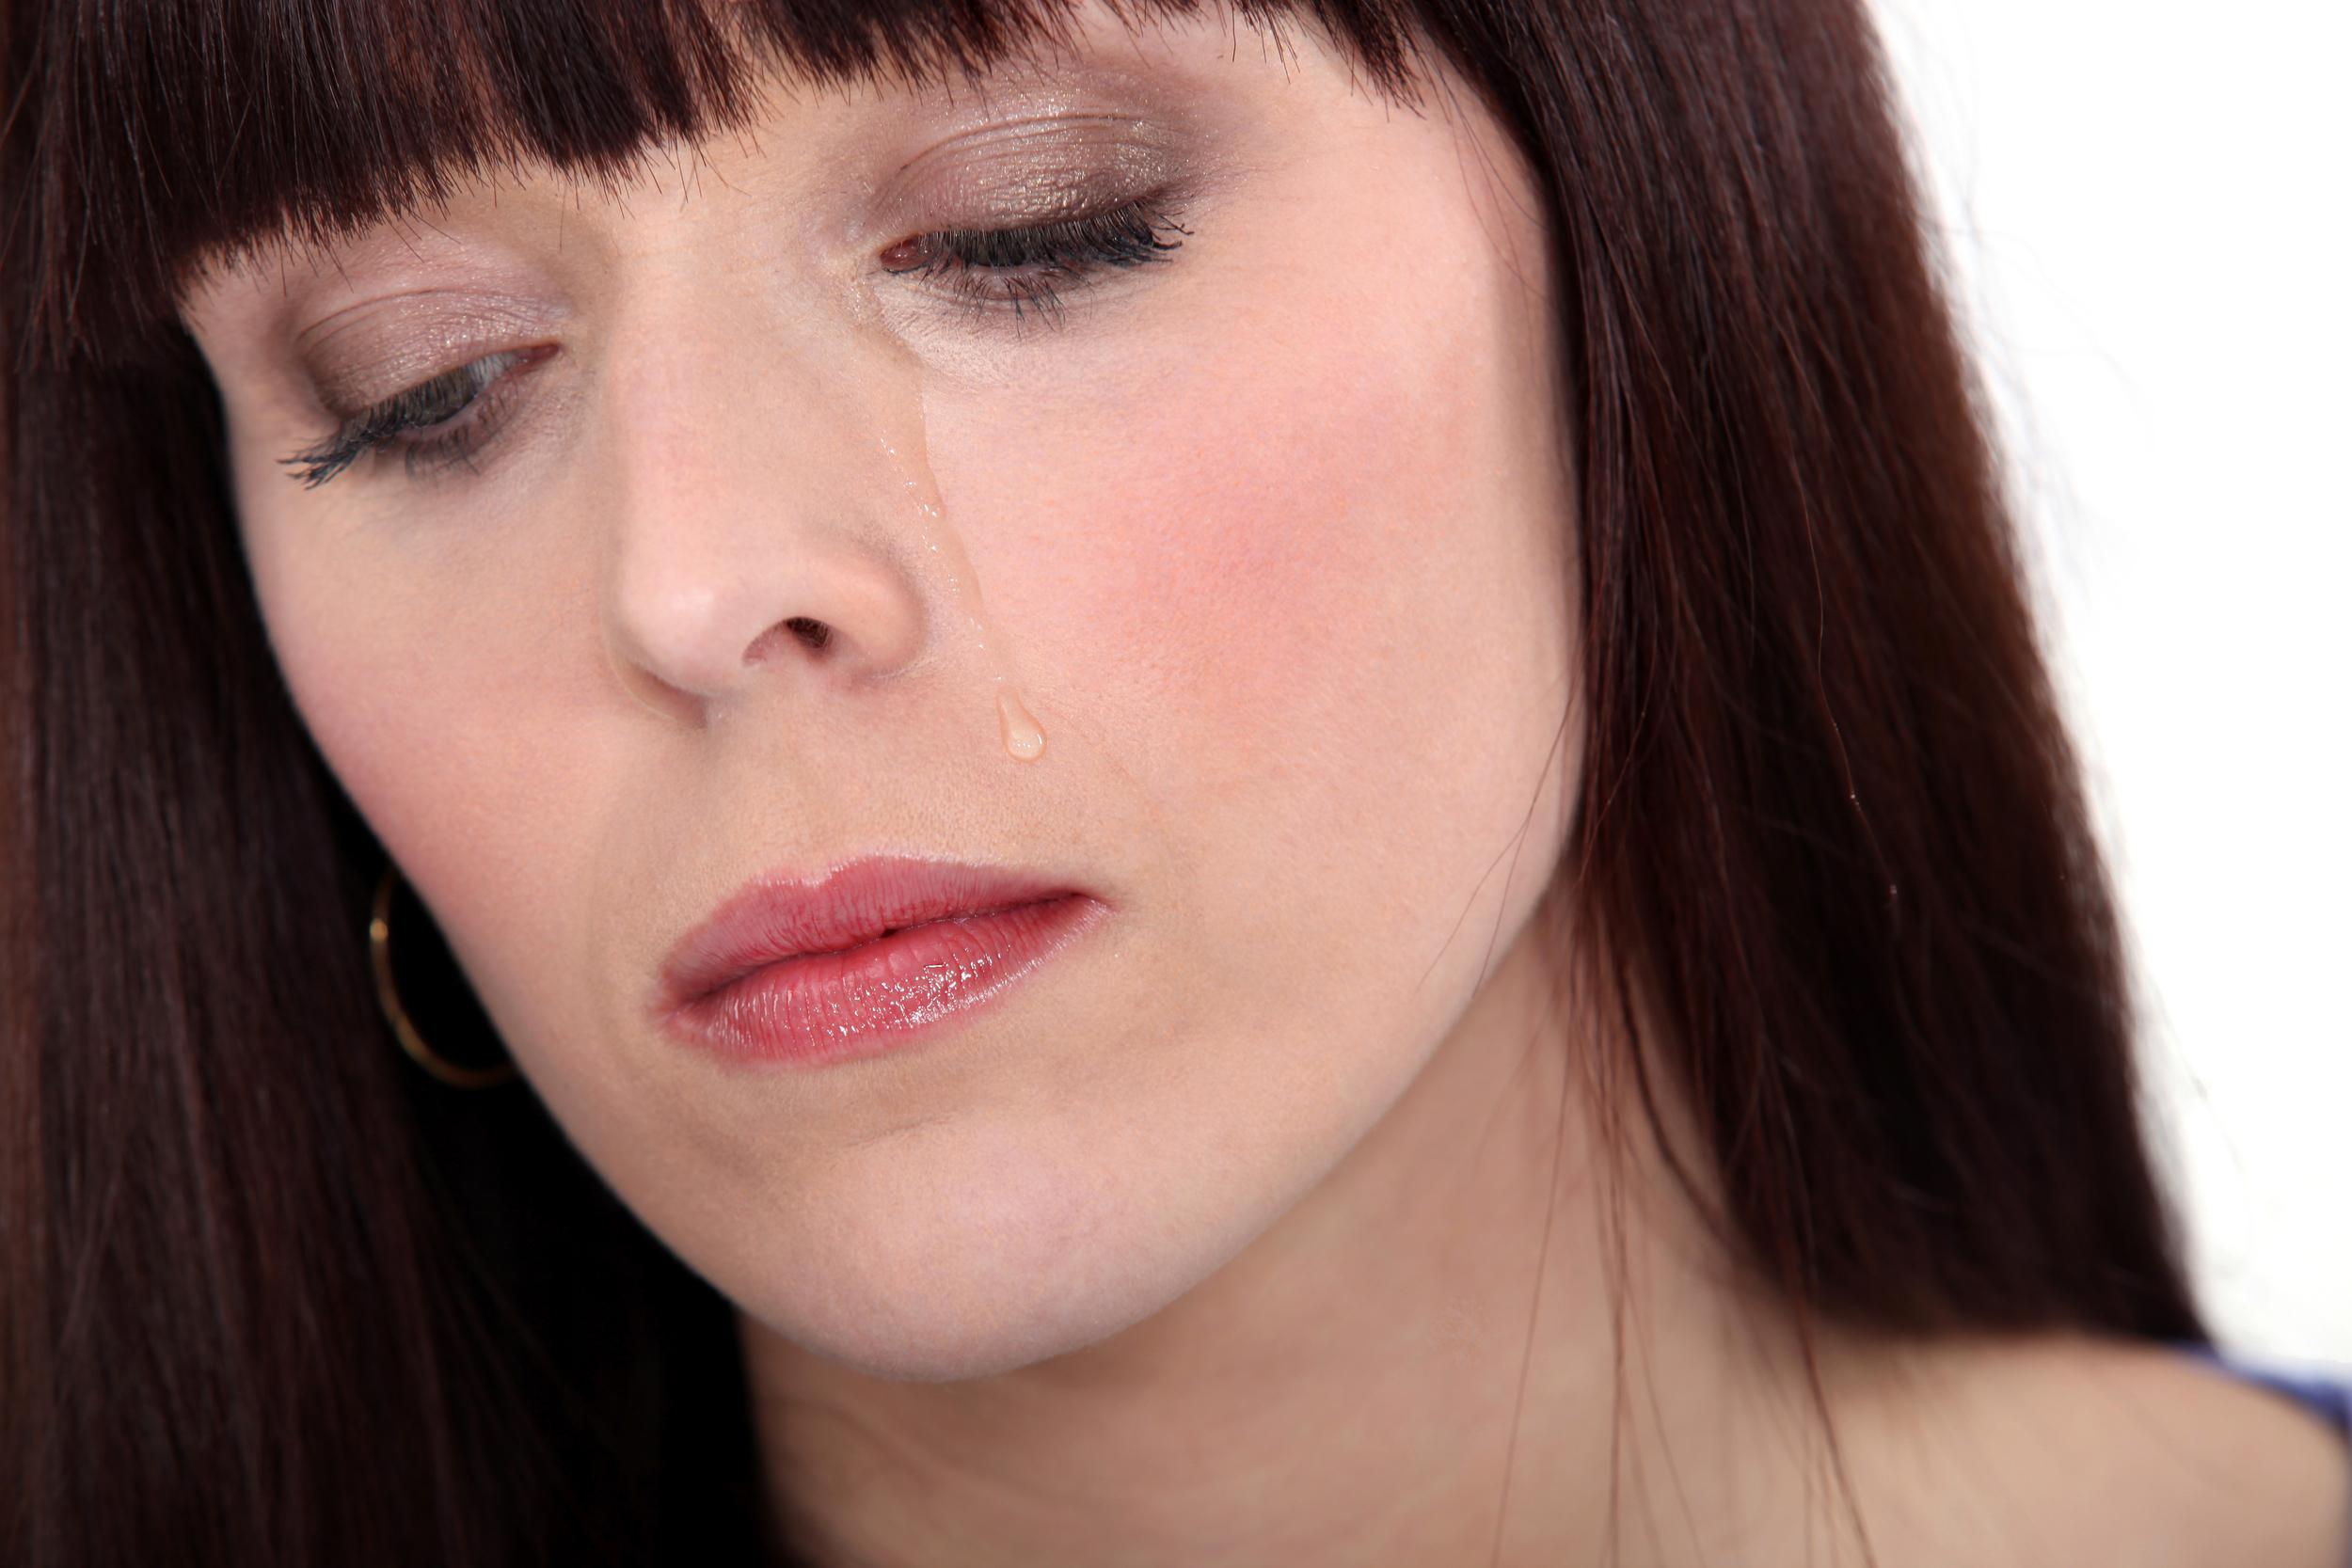 divorce breakup counseling austin, texas